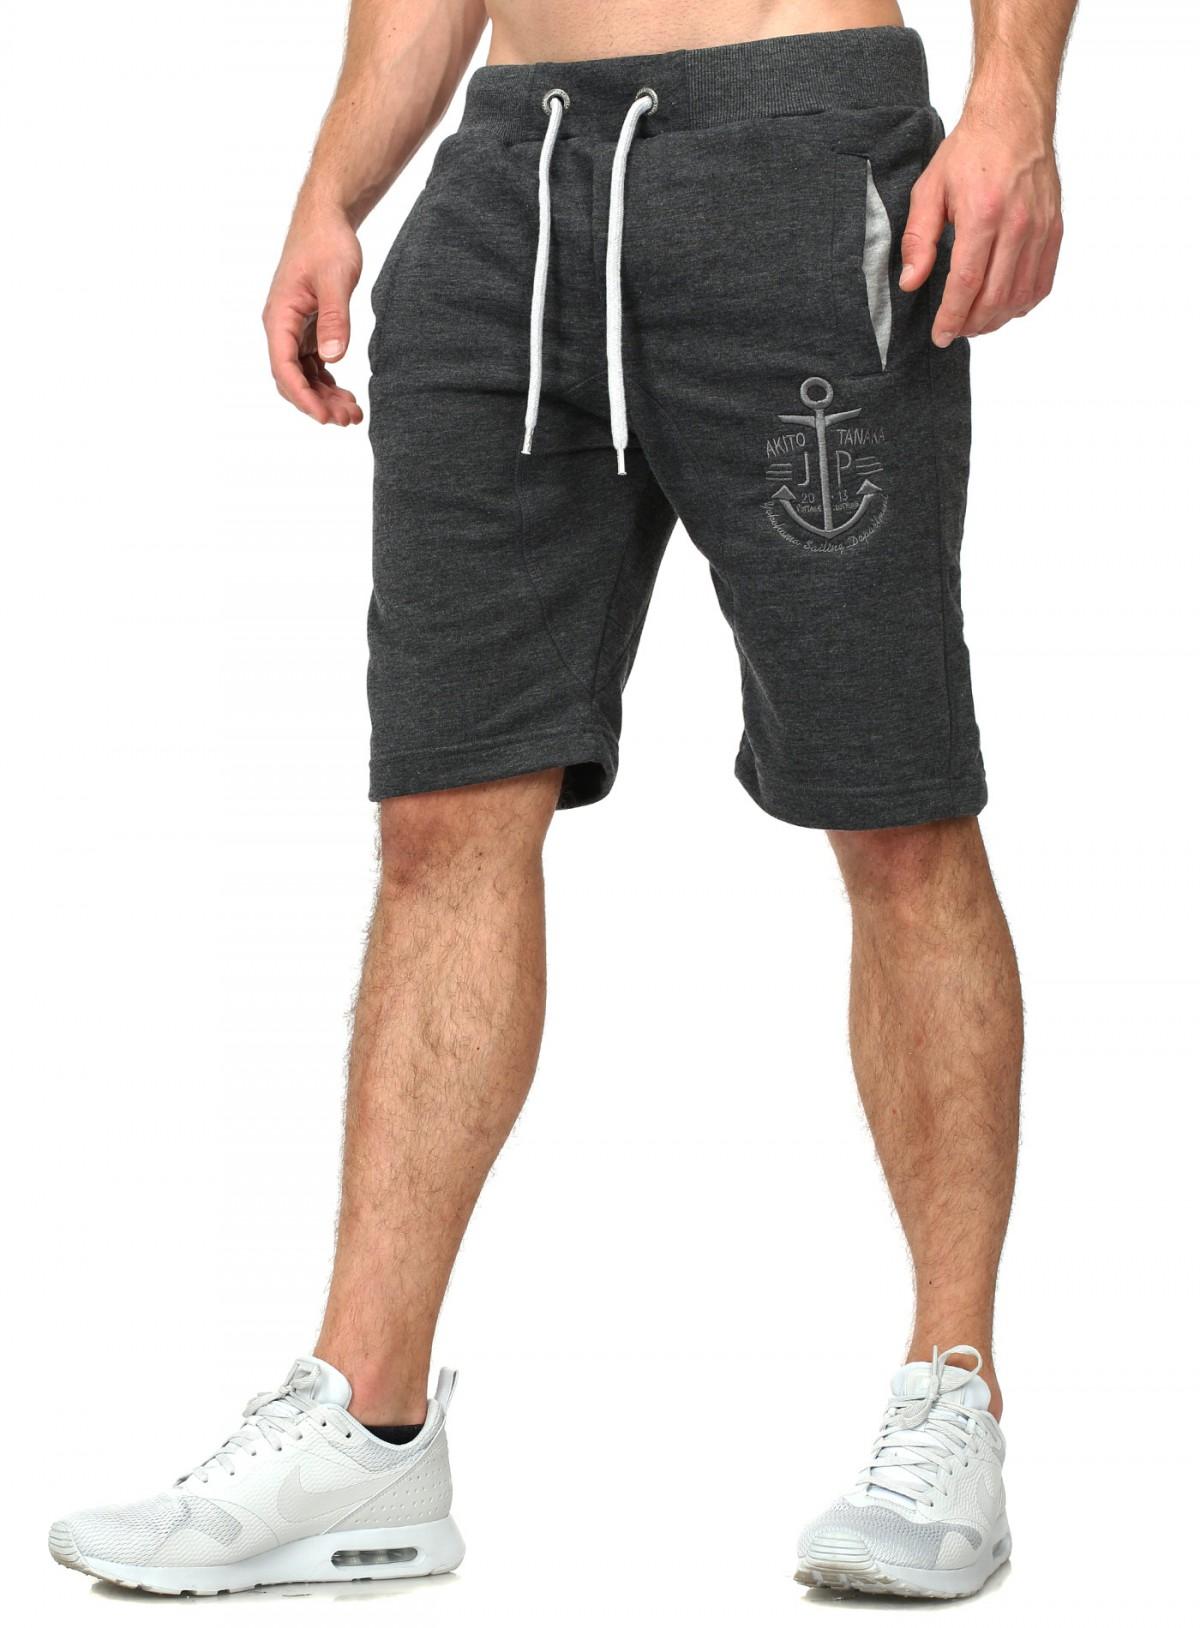 akito tanaka herren shorts mariner kurze sweatpants freizeit jogging trainings sport hose capri. Black Bedroom Furniture Sets. Home Design Ideas